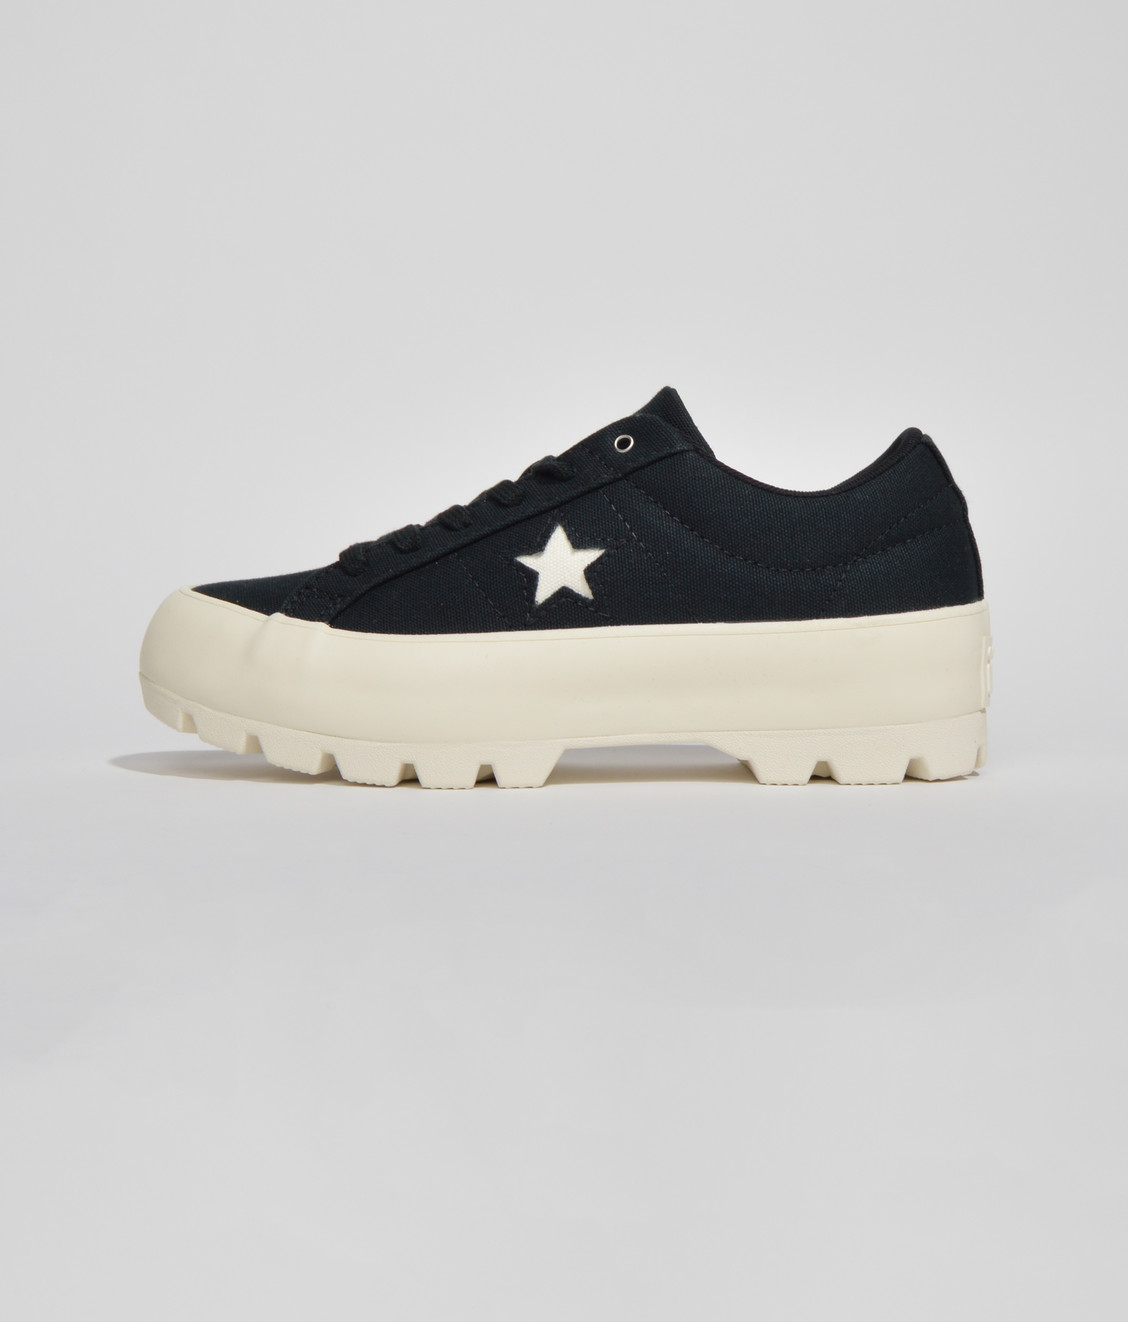 Converse Converse One Star Lugged OX Black